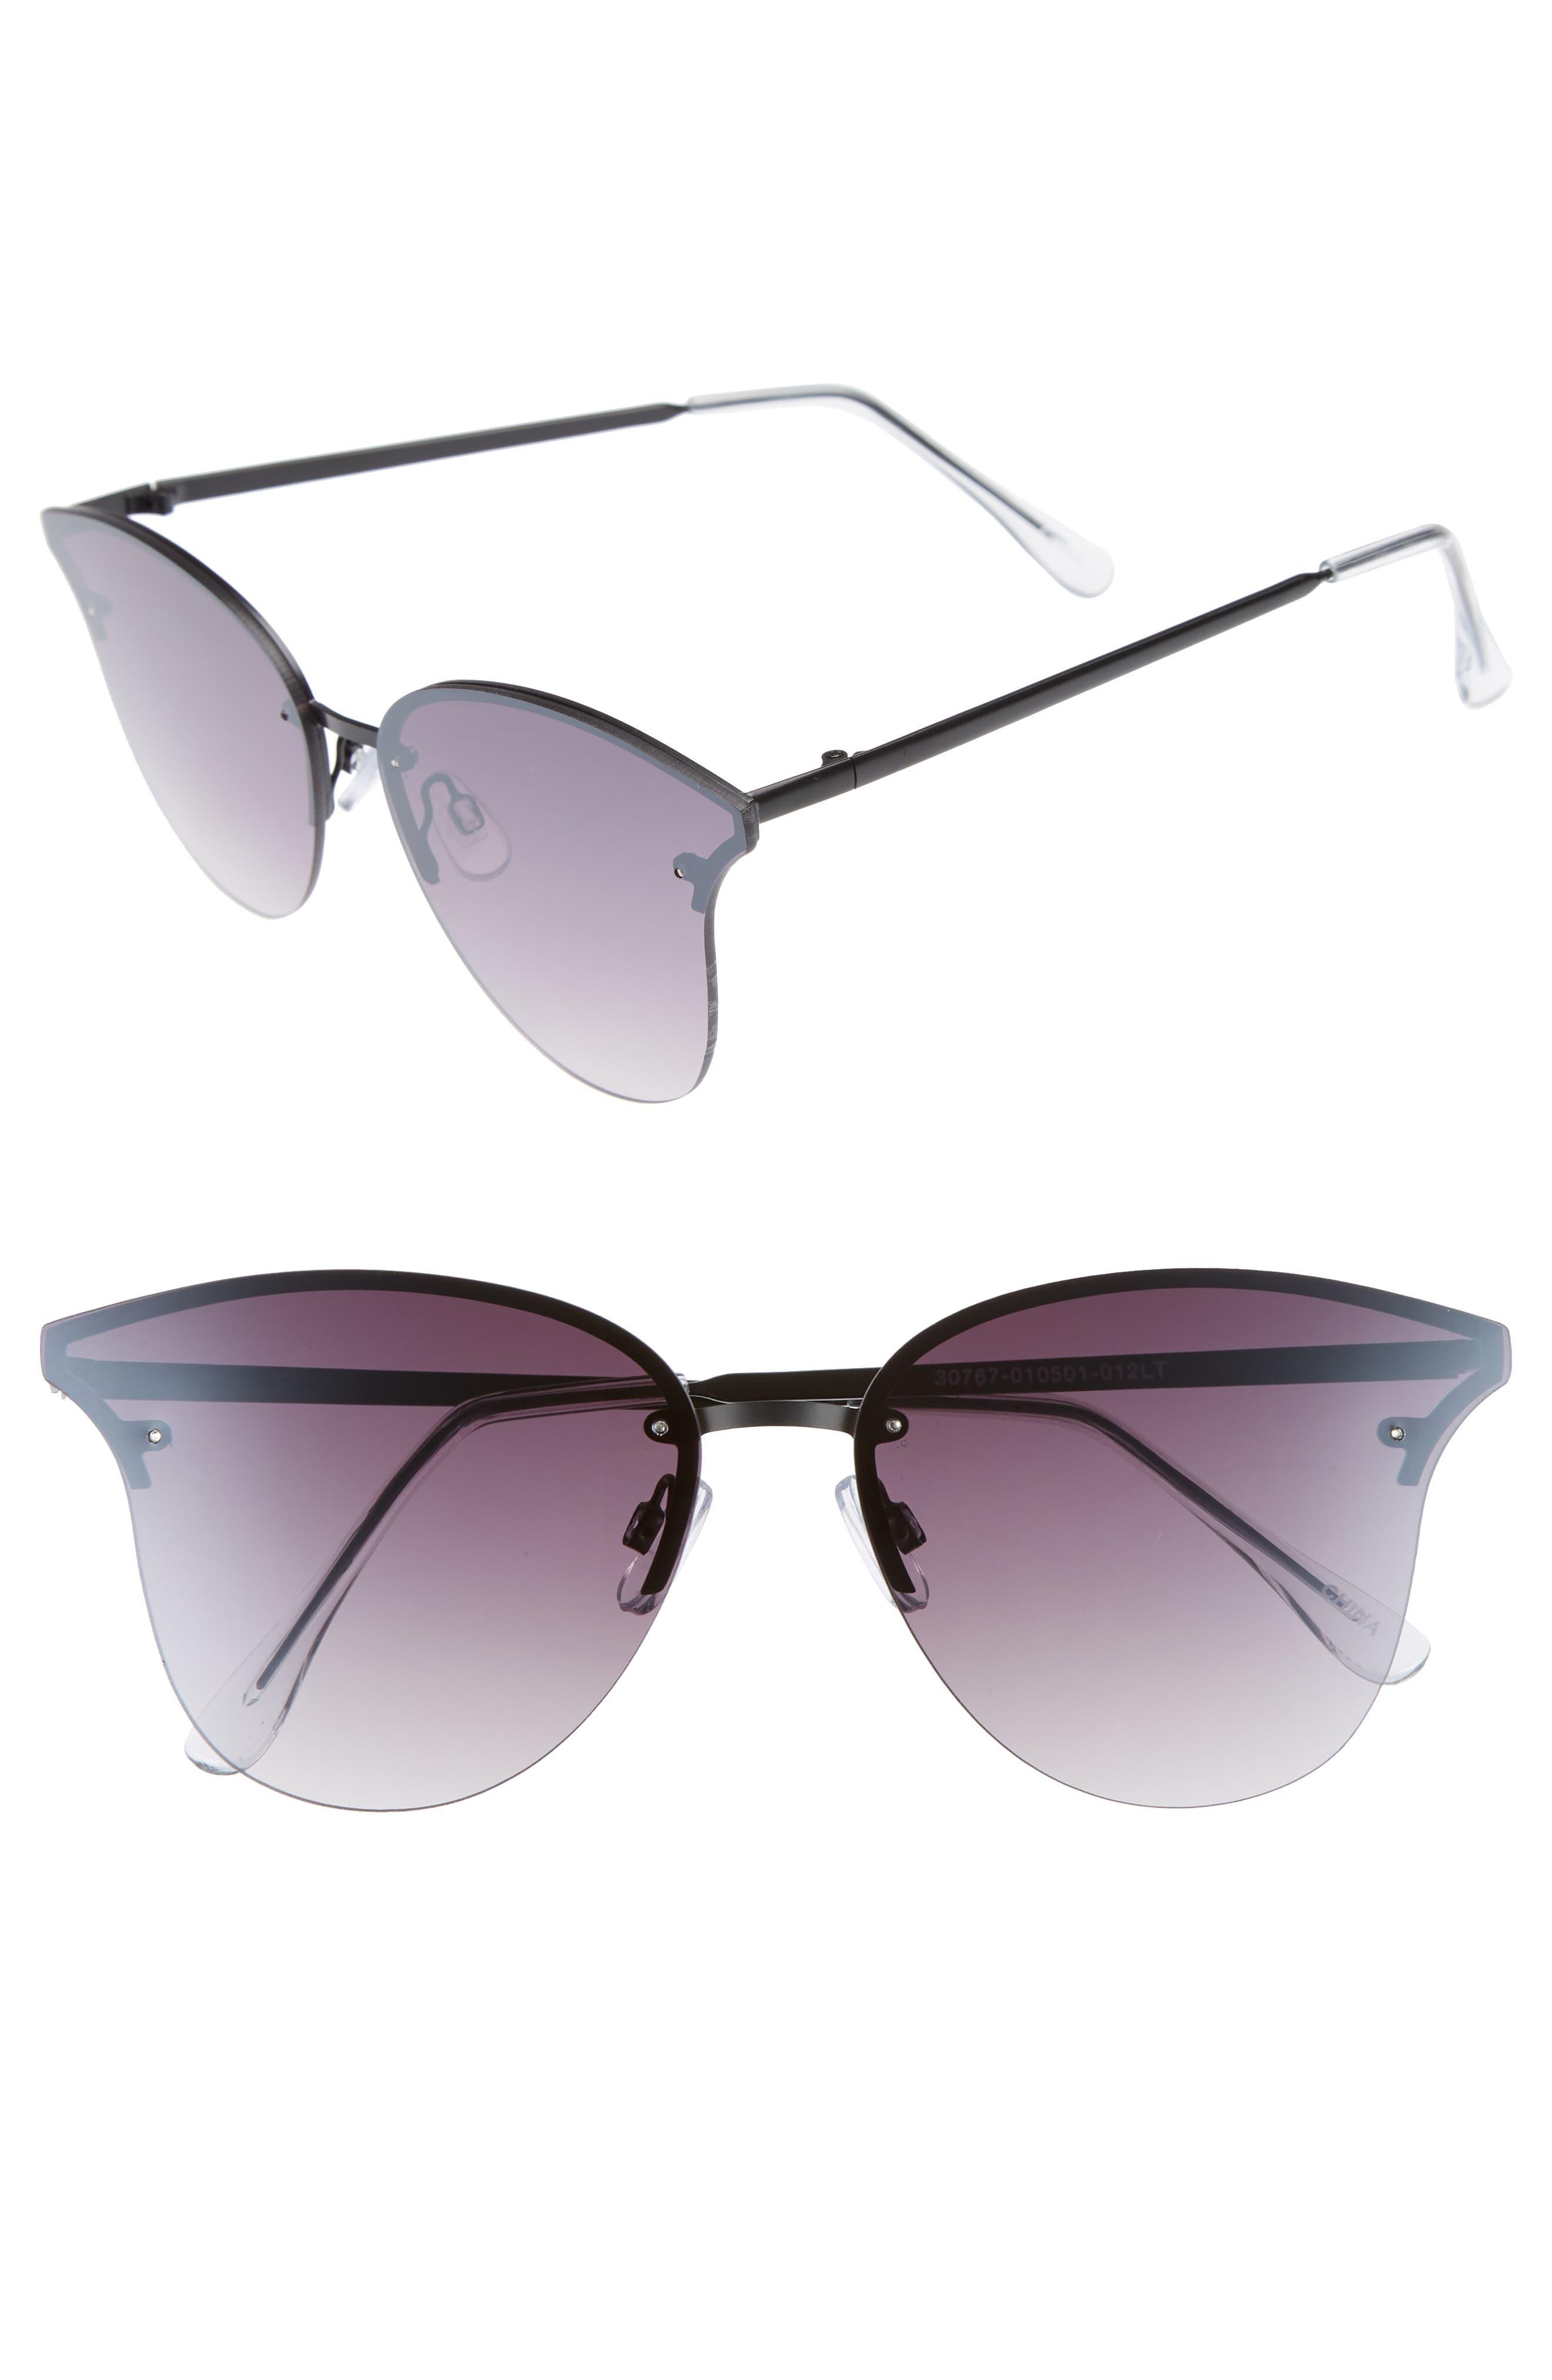 61mm Rimless Cat Eye Sunglasses,                         Main,                         color, Black/ Black